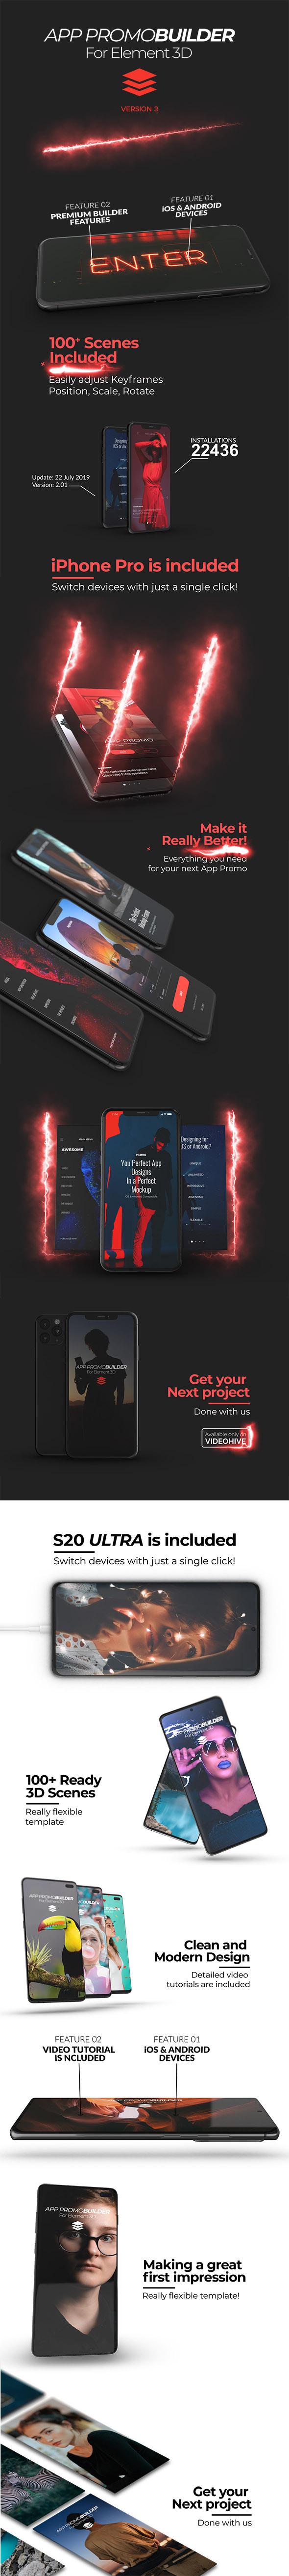 App Promo Builder for Element 3D - 6